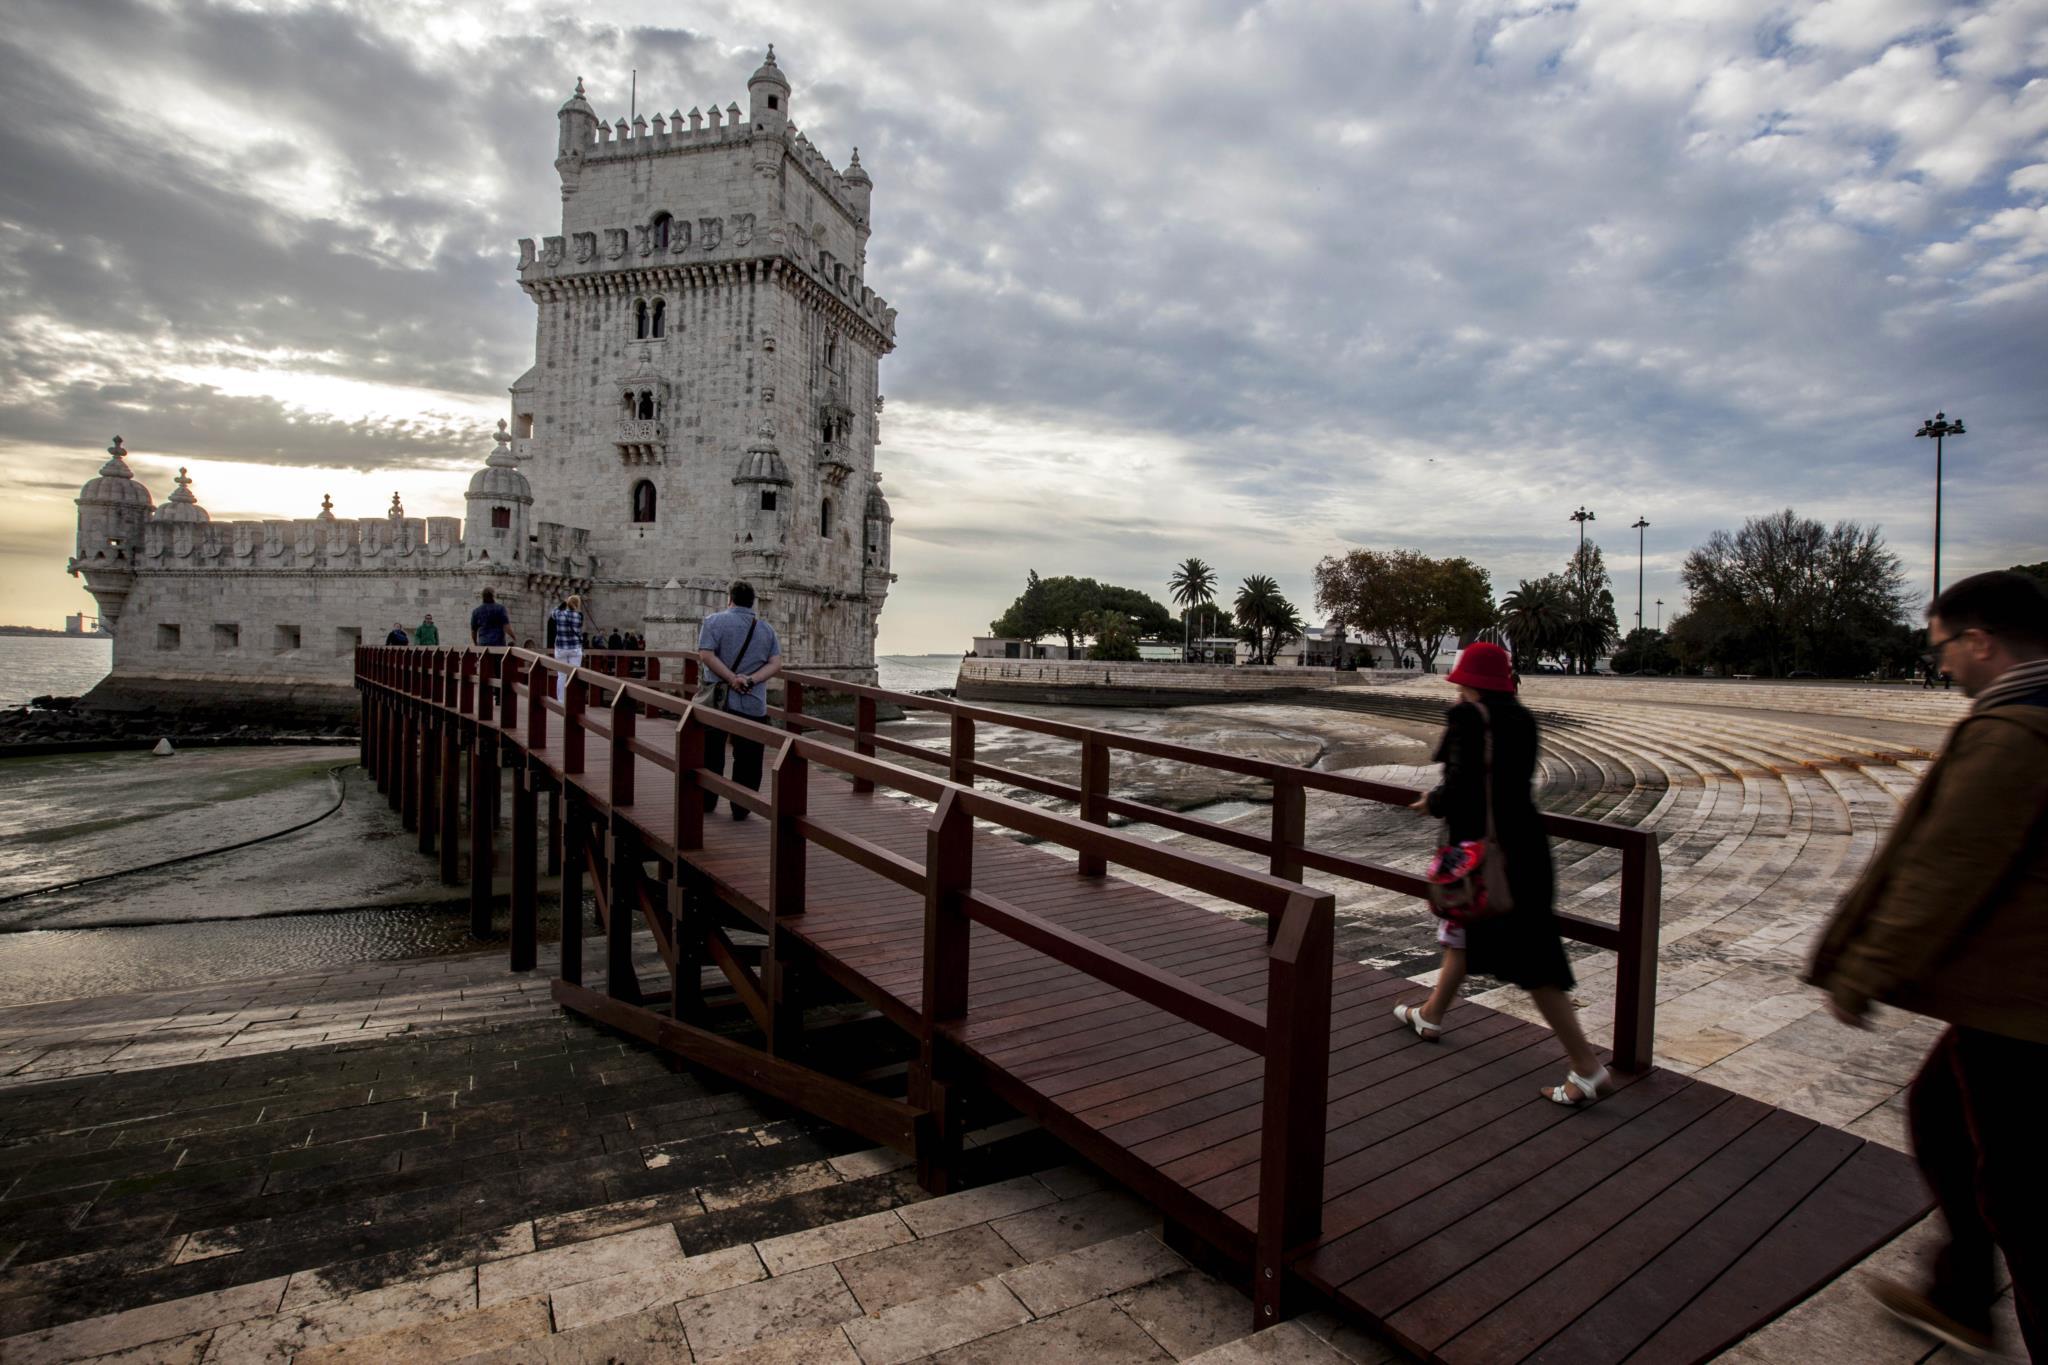 PÚBLICO - Alugueres ainda contam pouco nas receitas do património